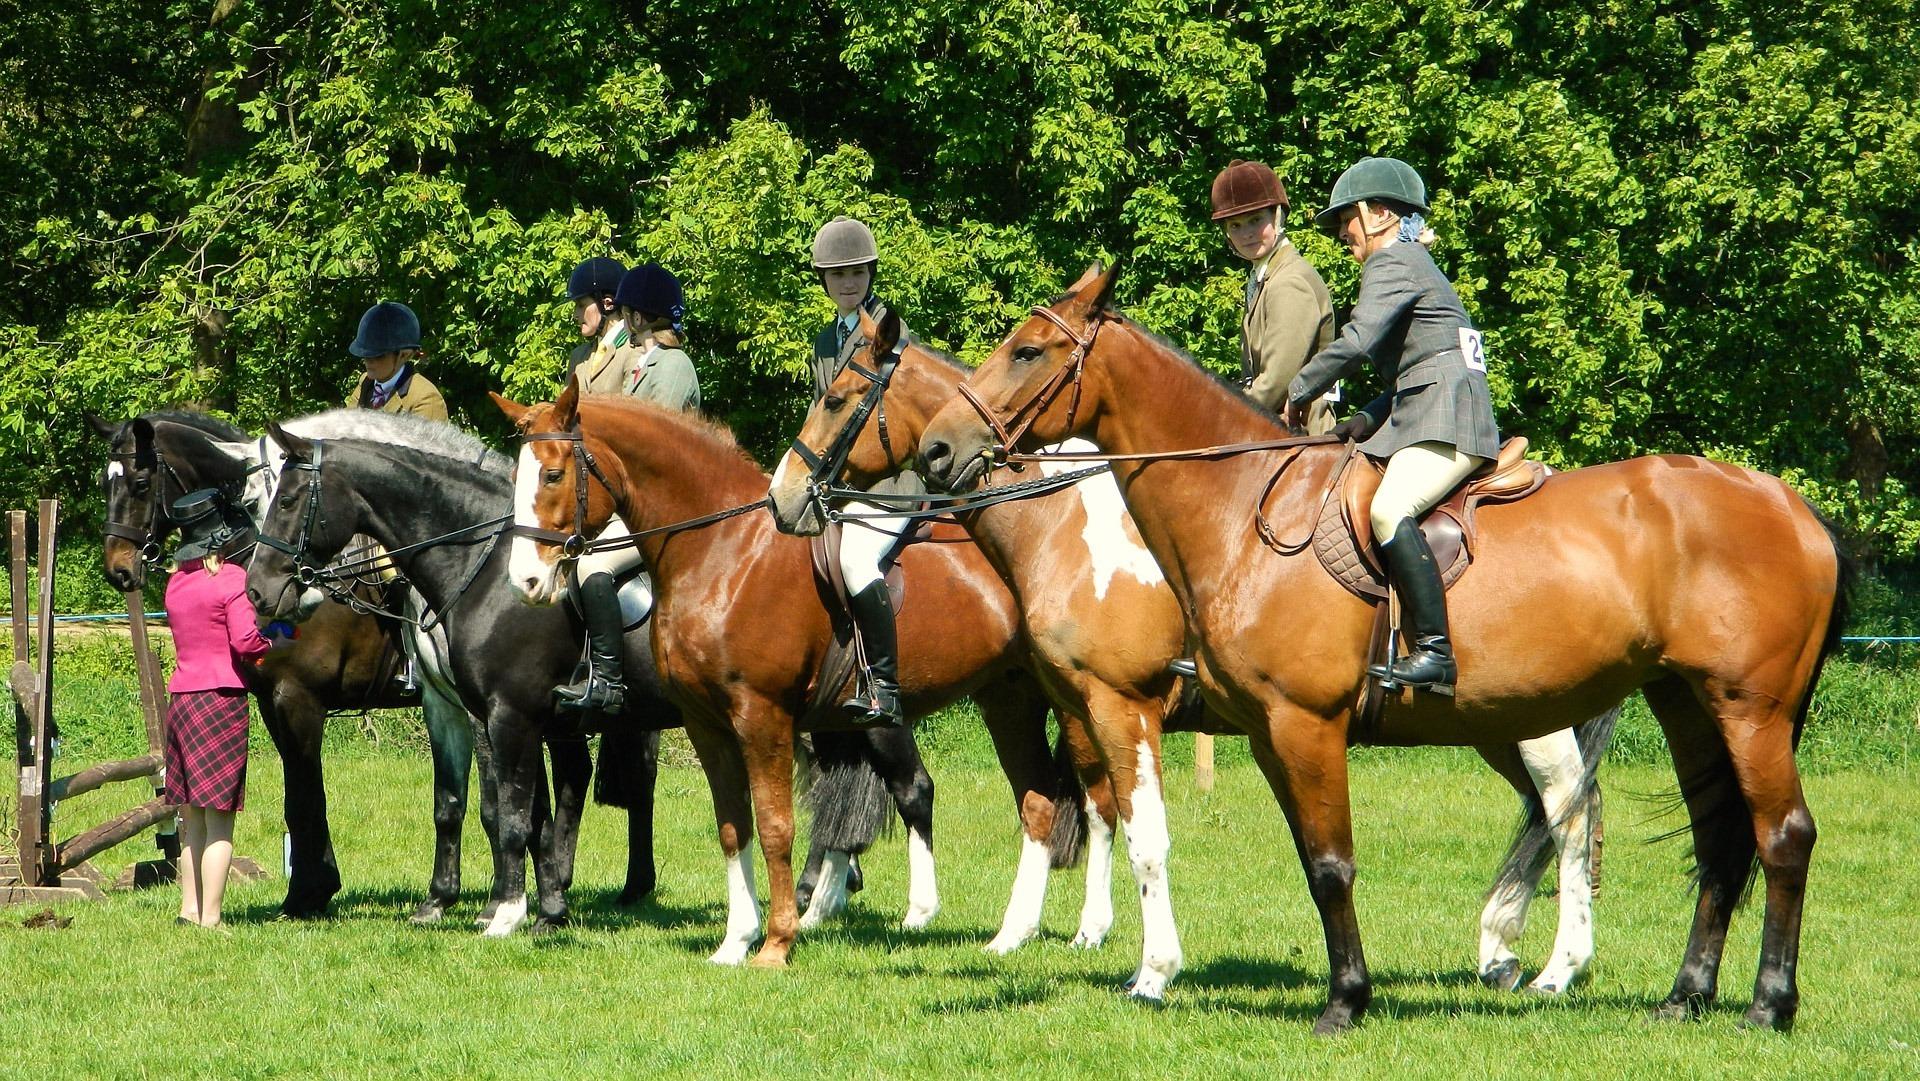 Horse, rider, show